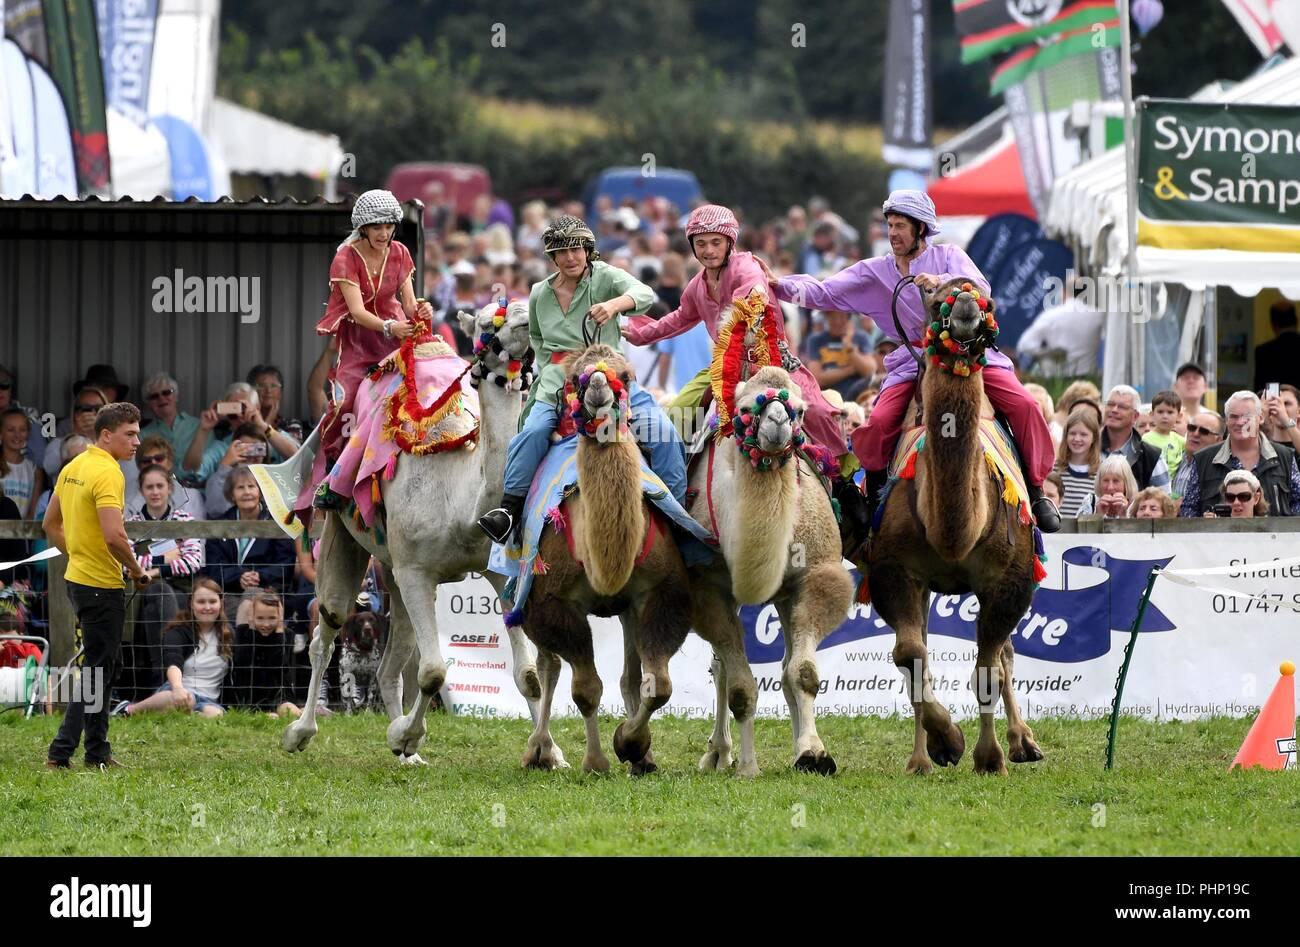 Dorchester, Dorset, UK. 2nd Sept, 2018. Dorset County Show, crowds enjoy the Camel racing. Credit: Finnbarr Webster/Alamy Live News - Stock Image